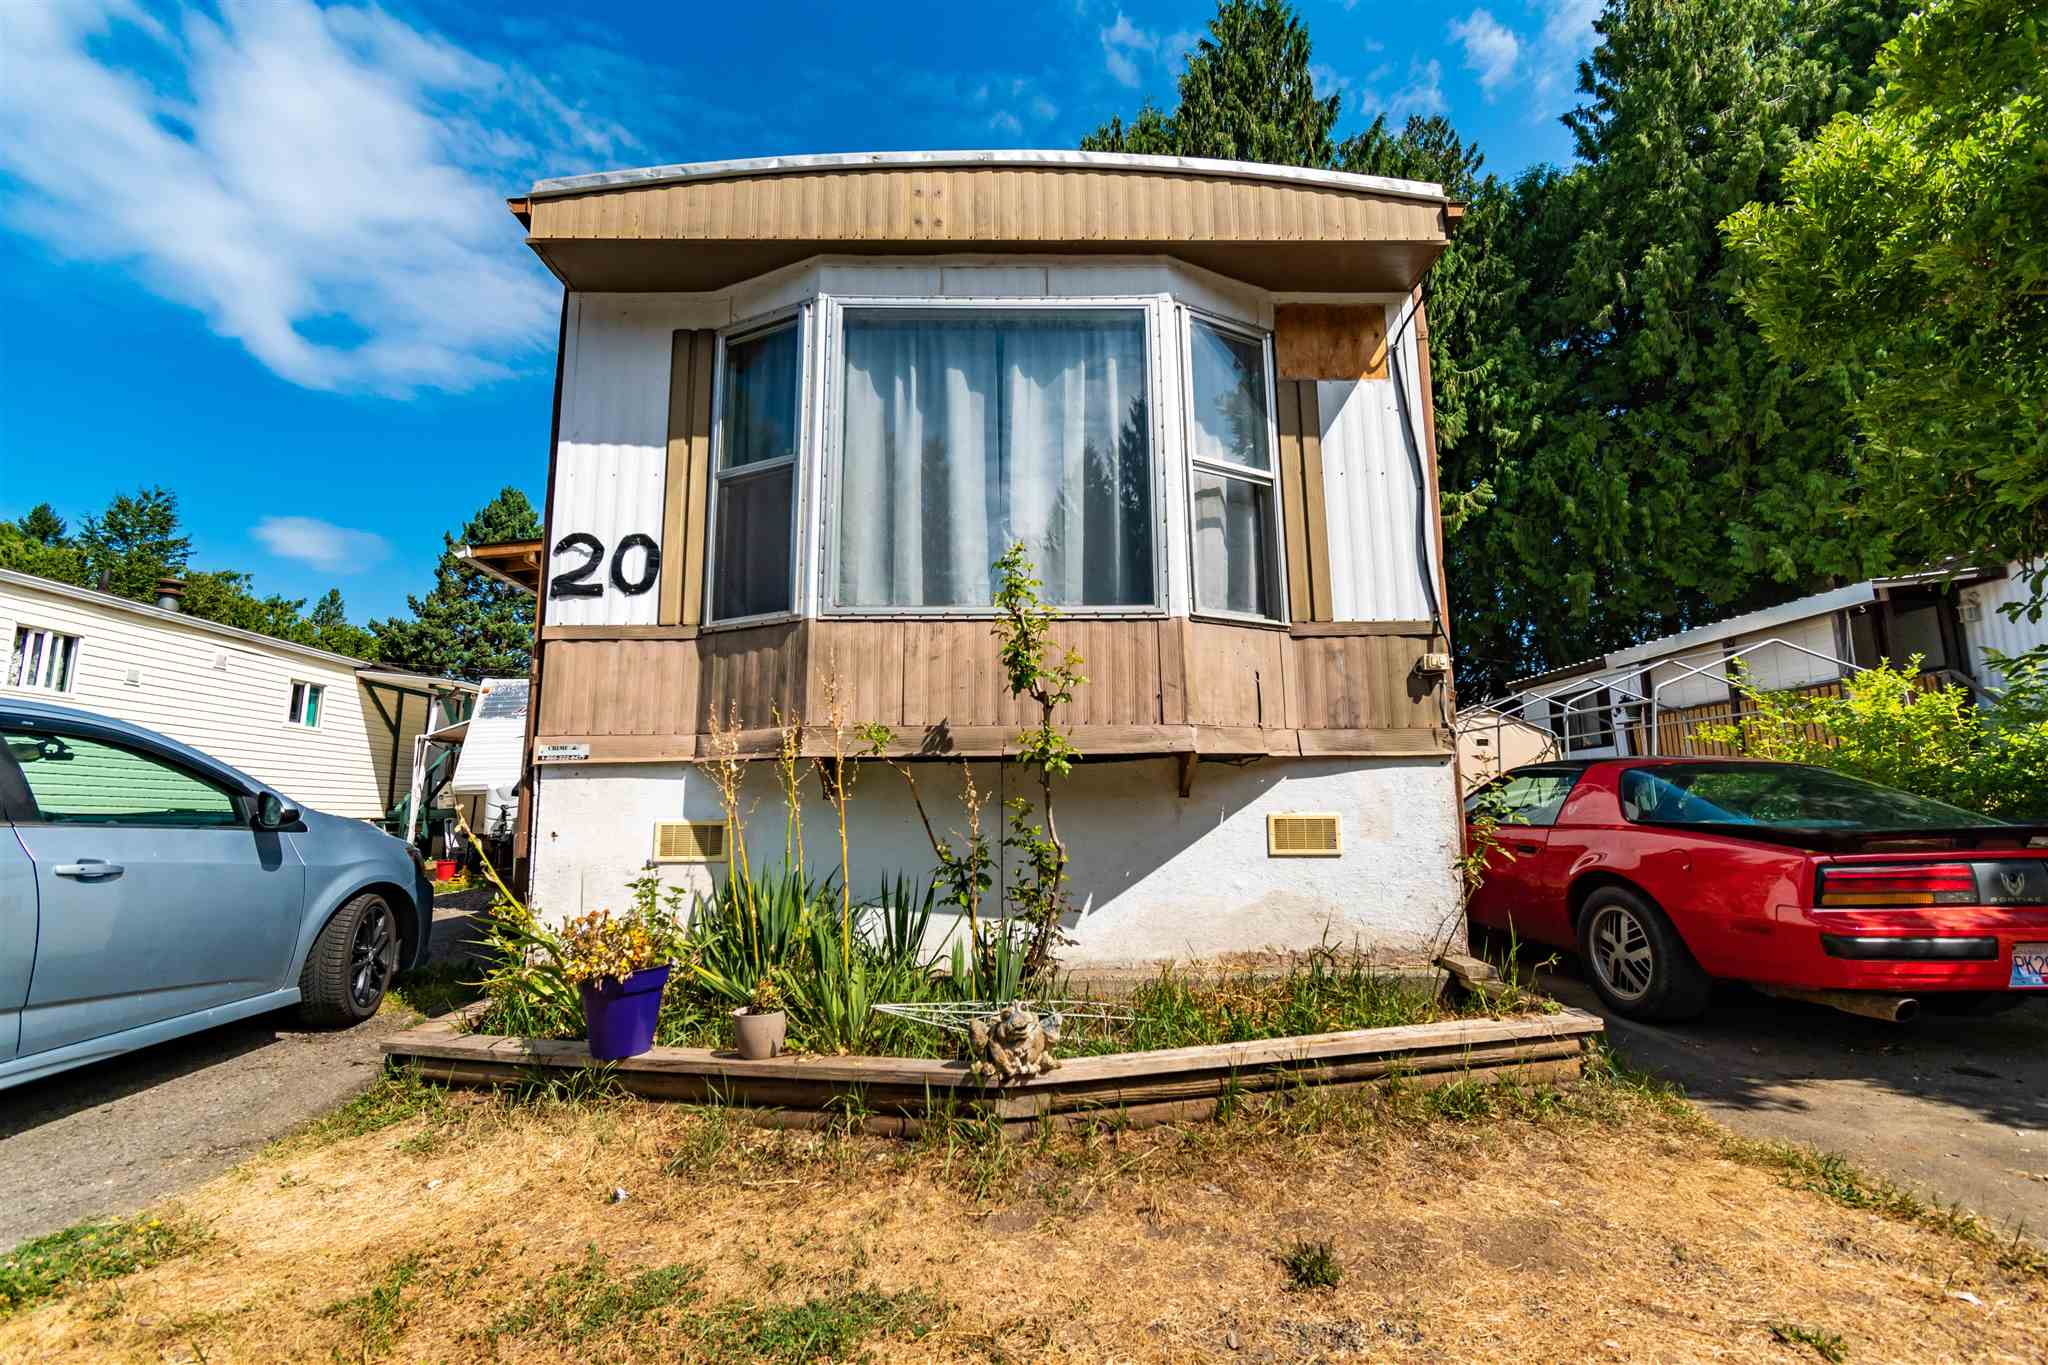 20 52604 YALE ROAD - Rosedale Popkum House/Single Family for sale, 3 Bedrooms (R2604762) - #1